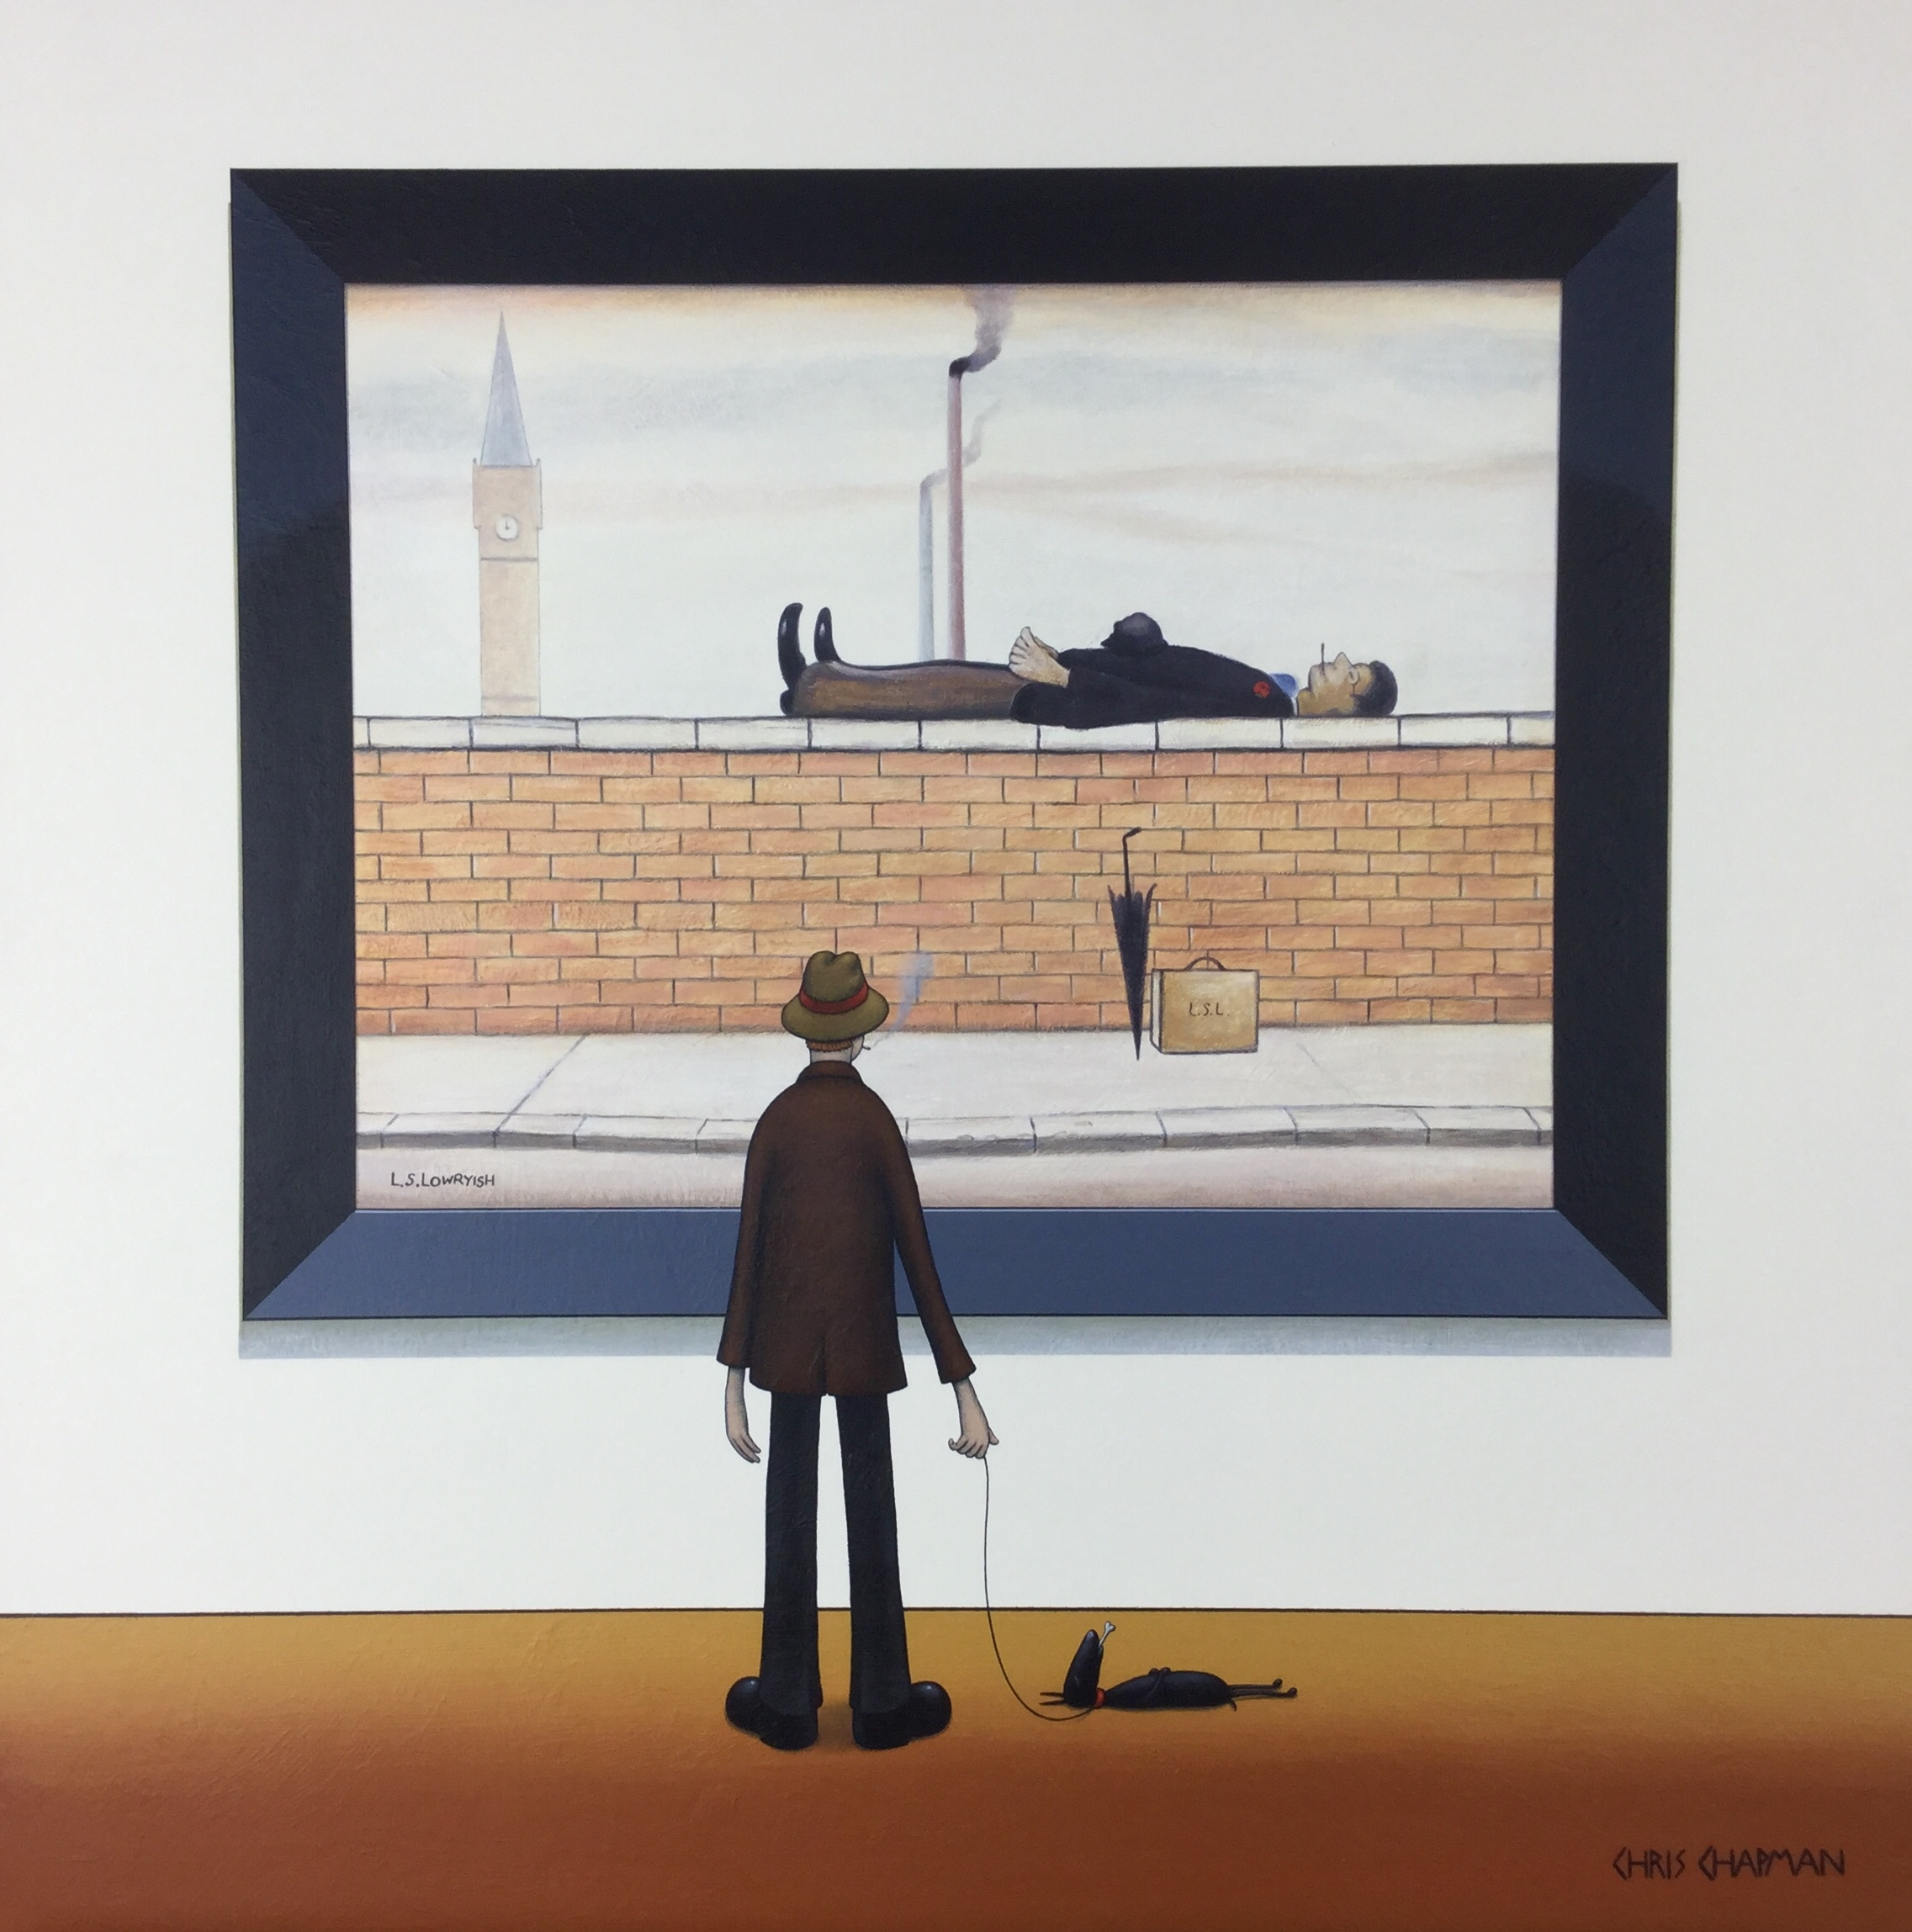 L.S. Lowryish - SOLD